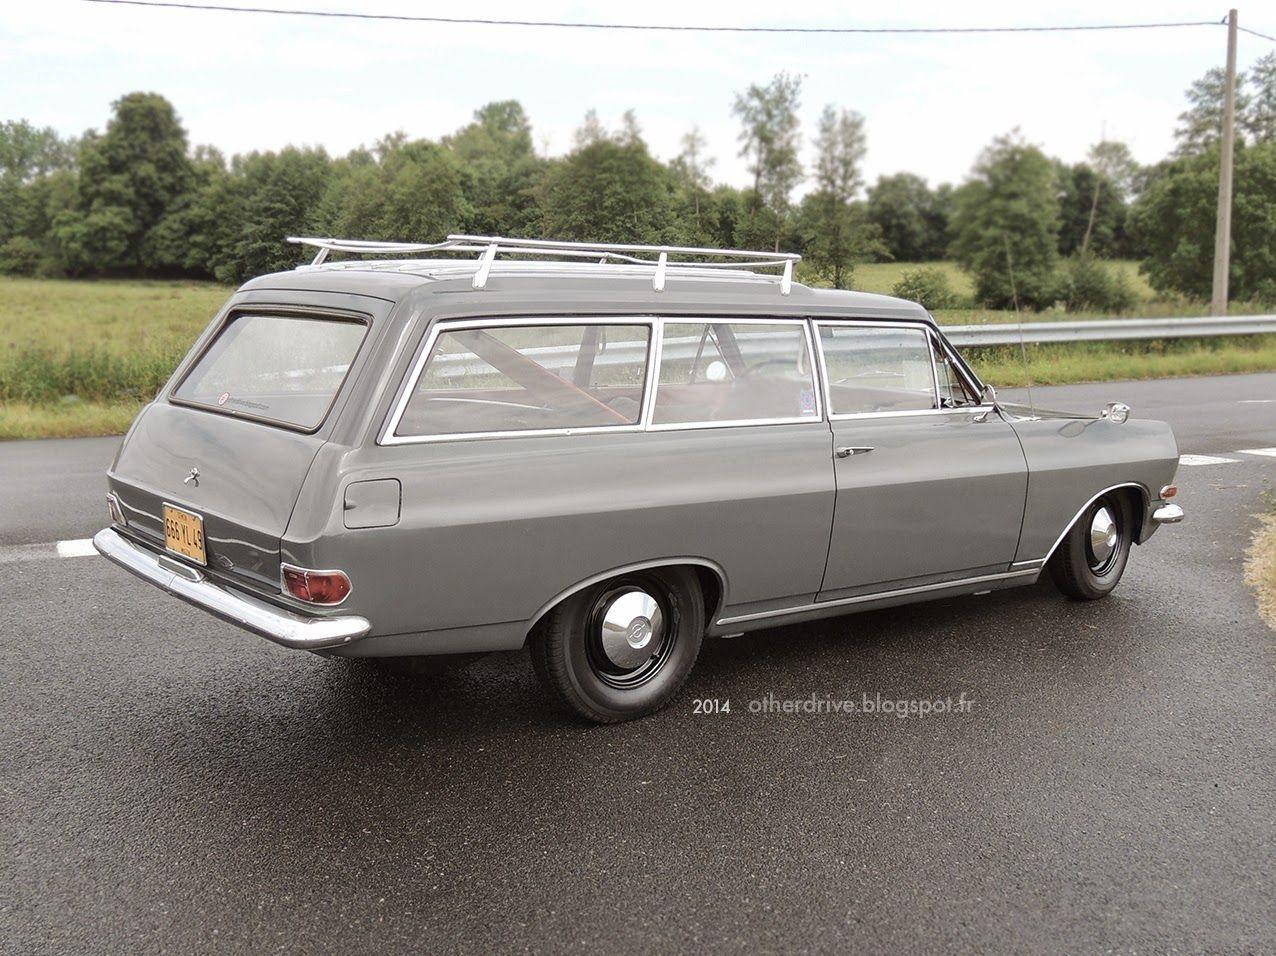 Opel rekord b caravan luxury cars pinterest station wagon opel rekord b caravan station wagonjacoluxury sciox Choice Image